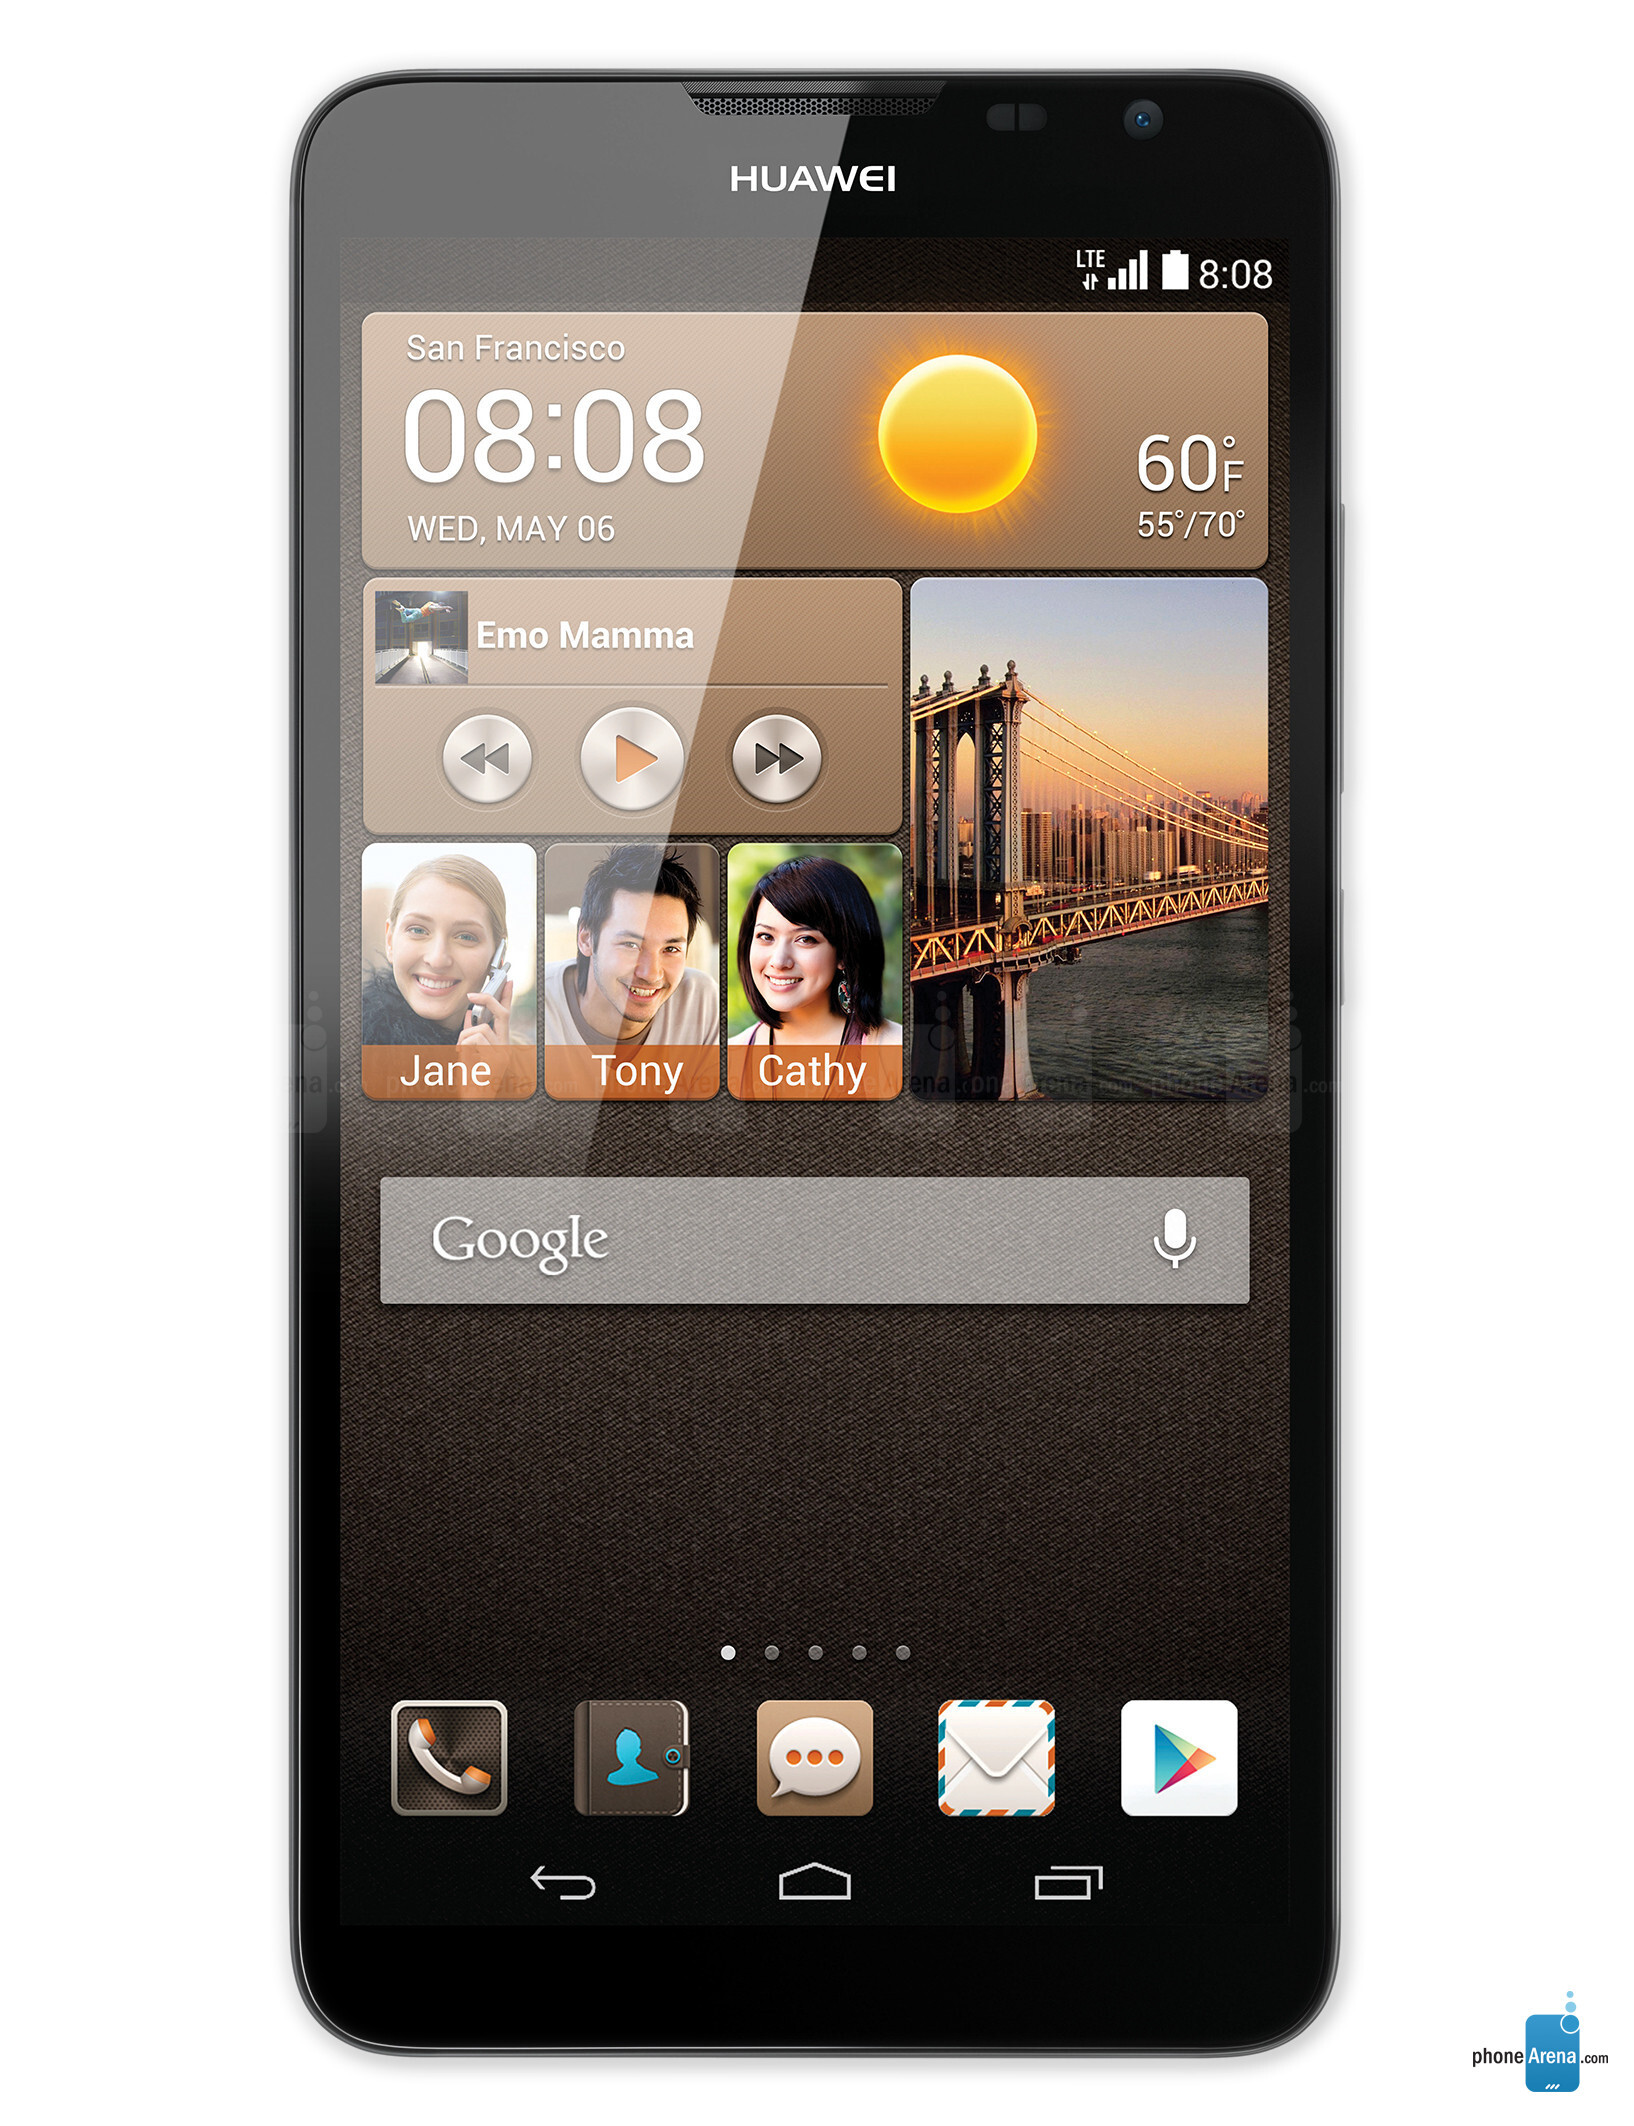 Huawei Ascend Mate 2 4G specs